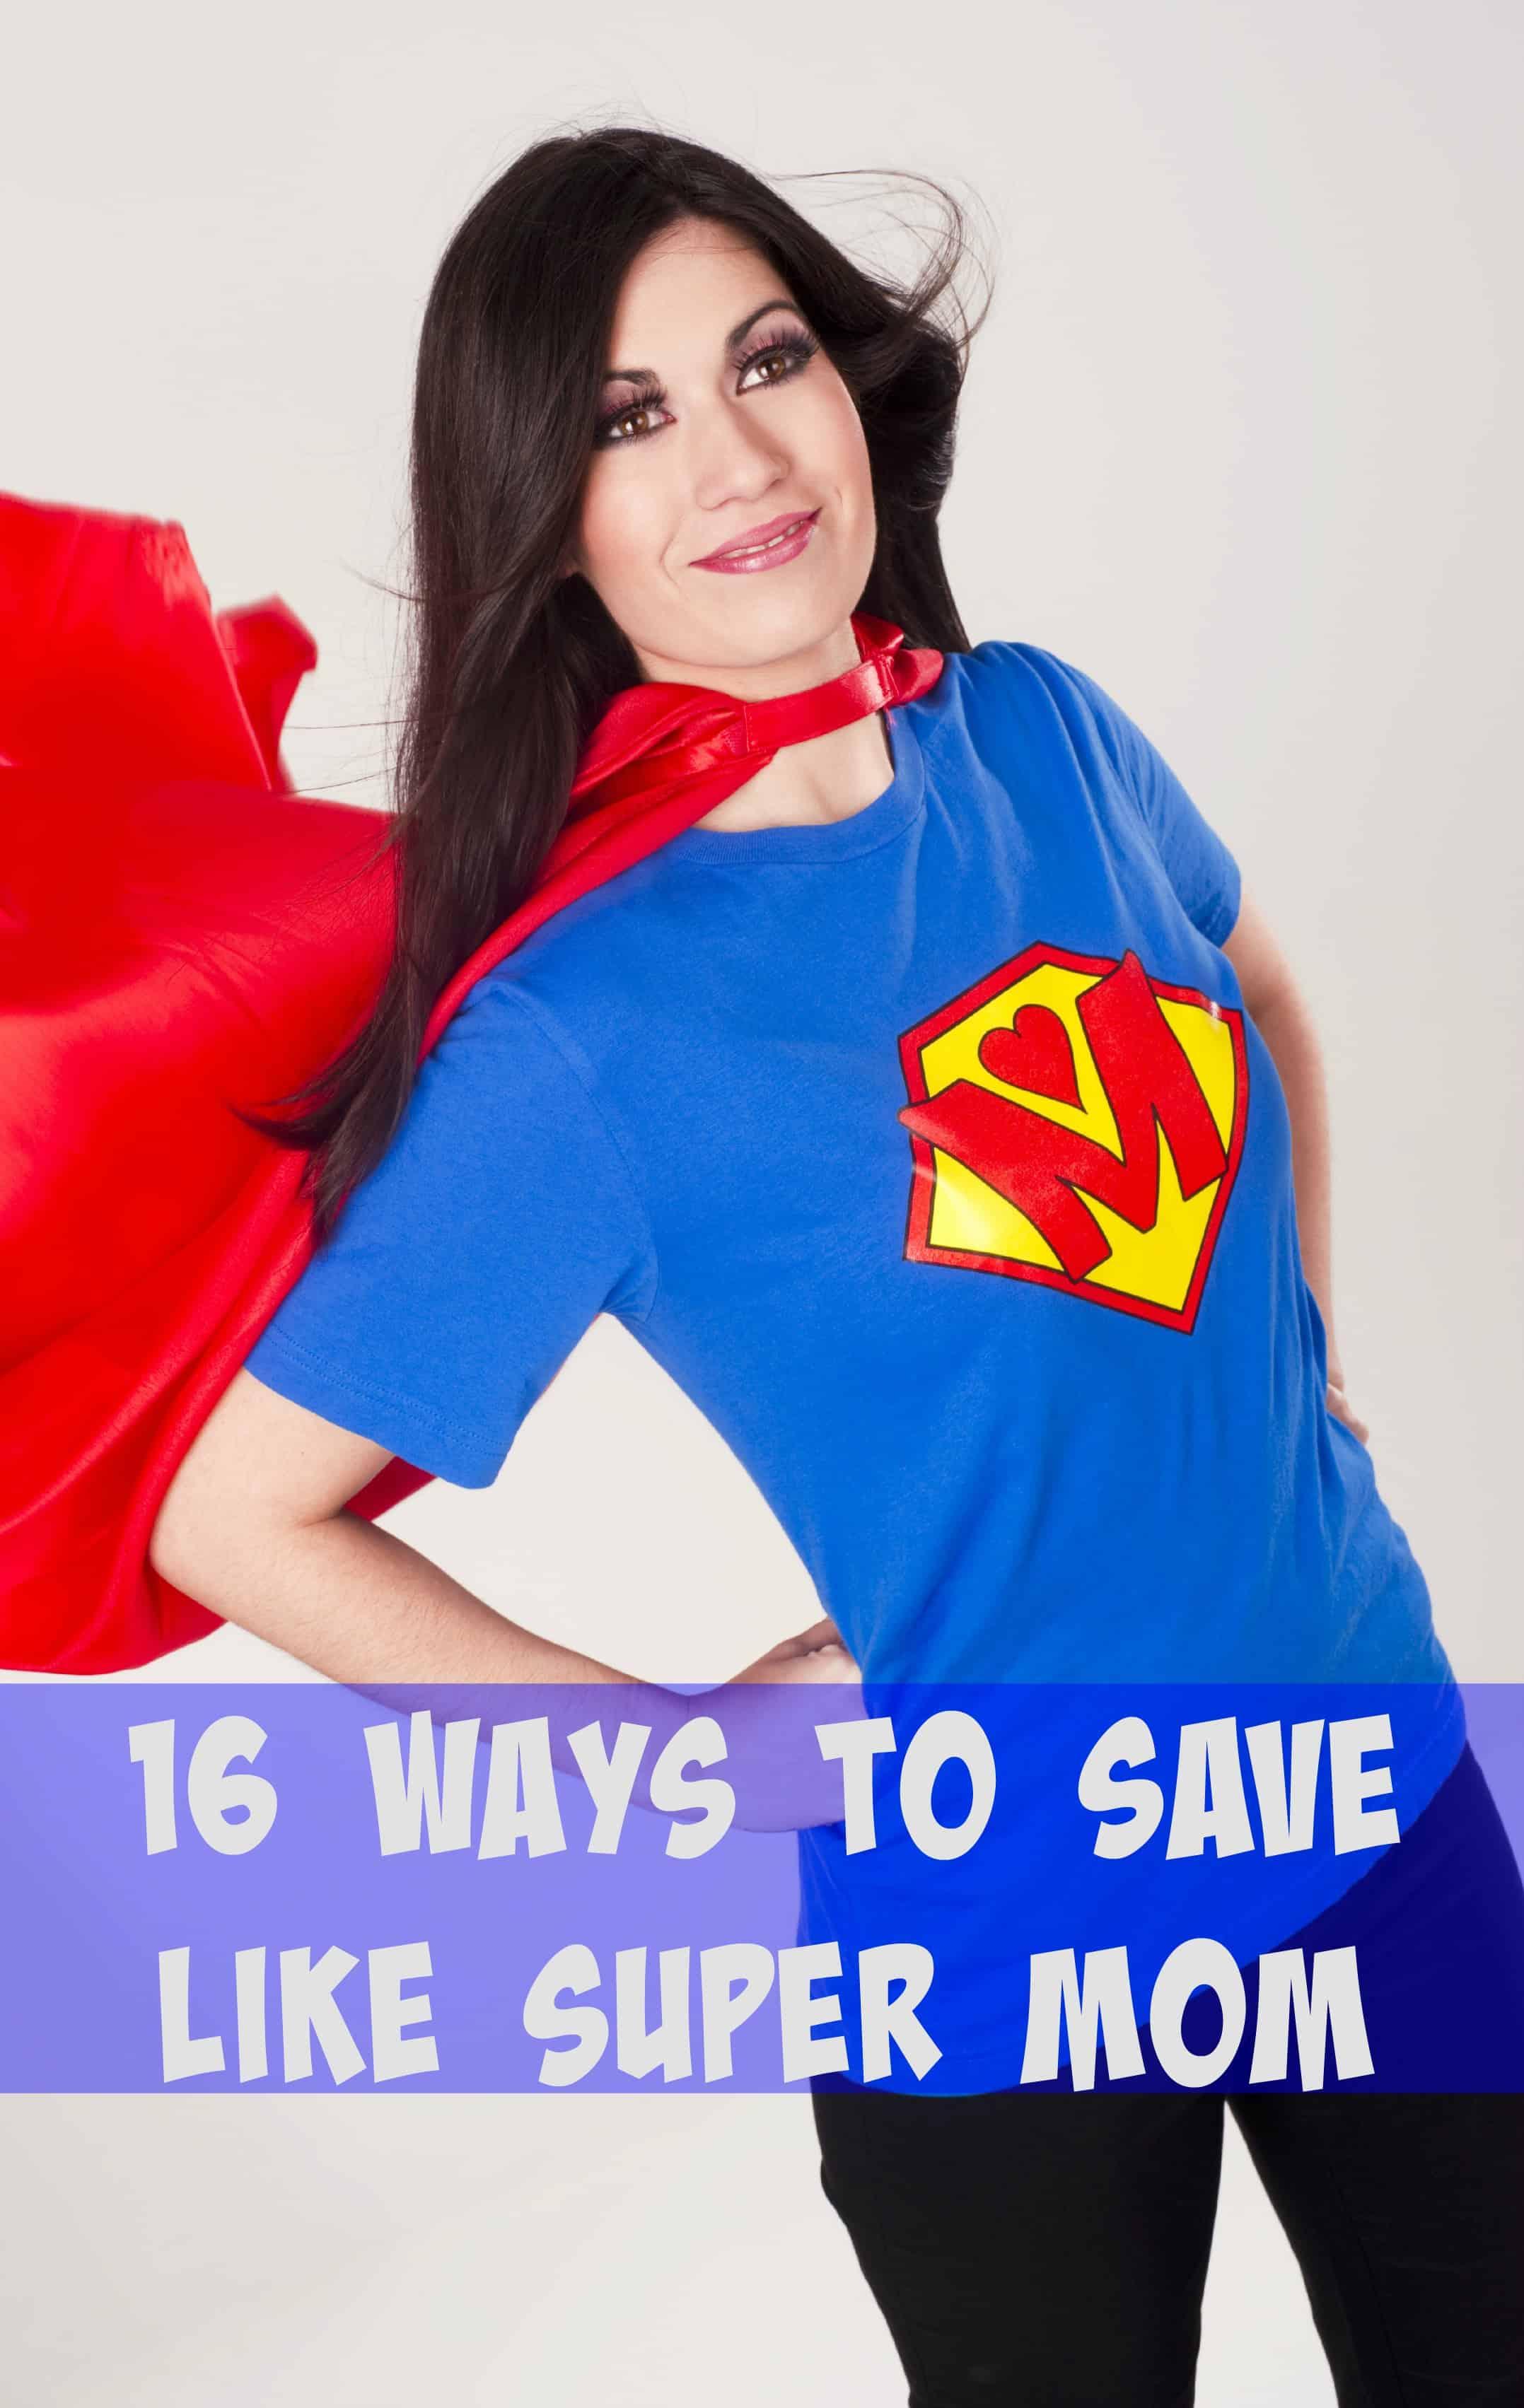 16 Ways To Save Like Super Mom